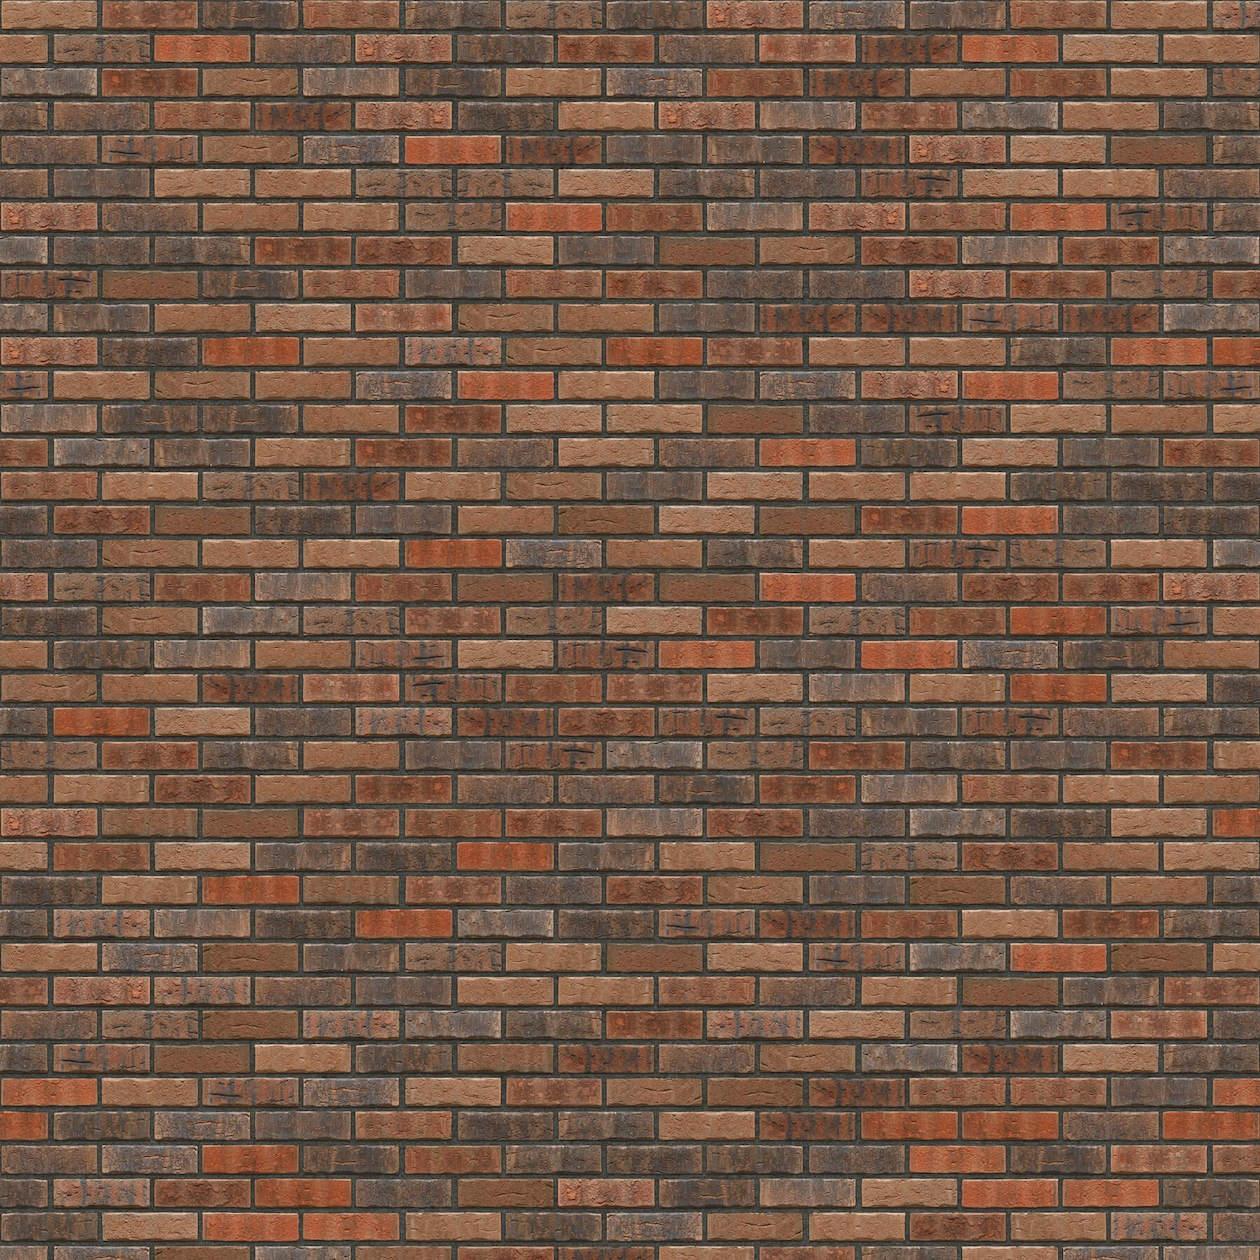 Puna-cigla-FeldHaus-Klinker-brick-house-nf-k-685-Antracit Fuga